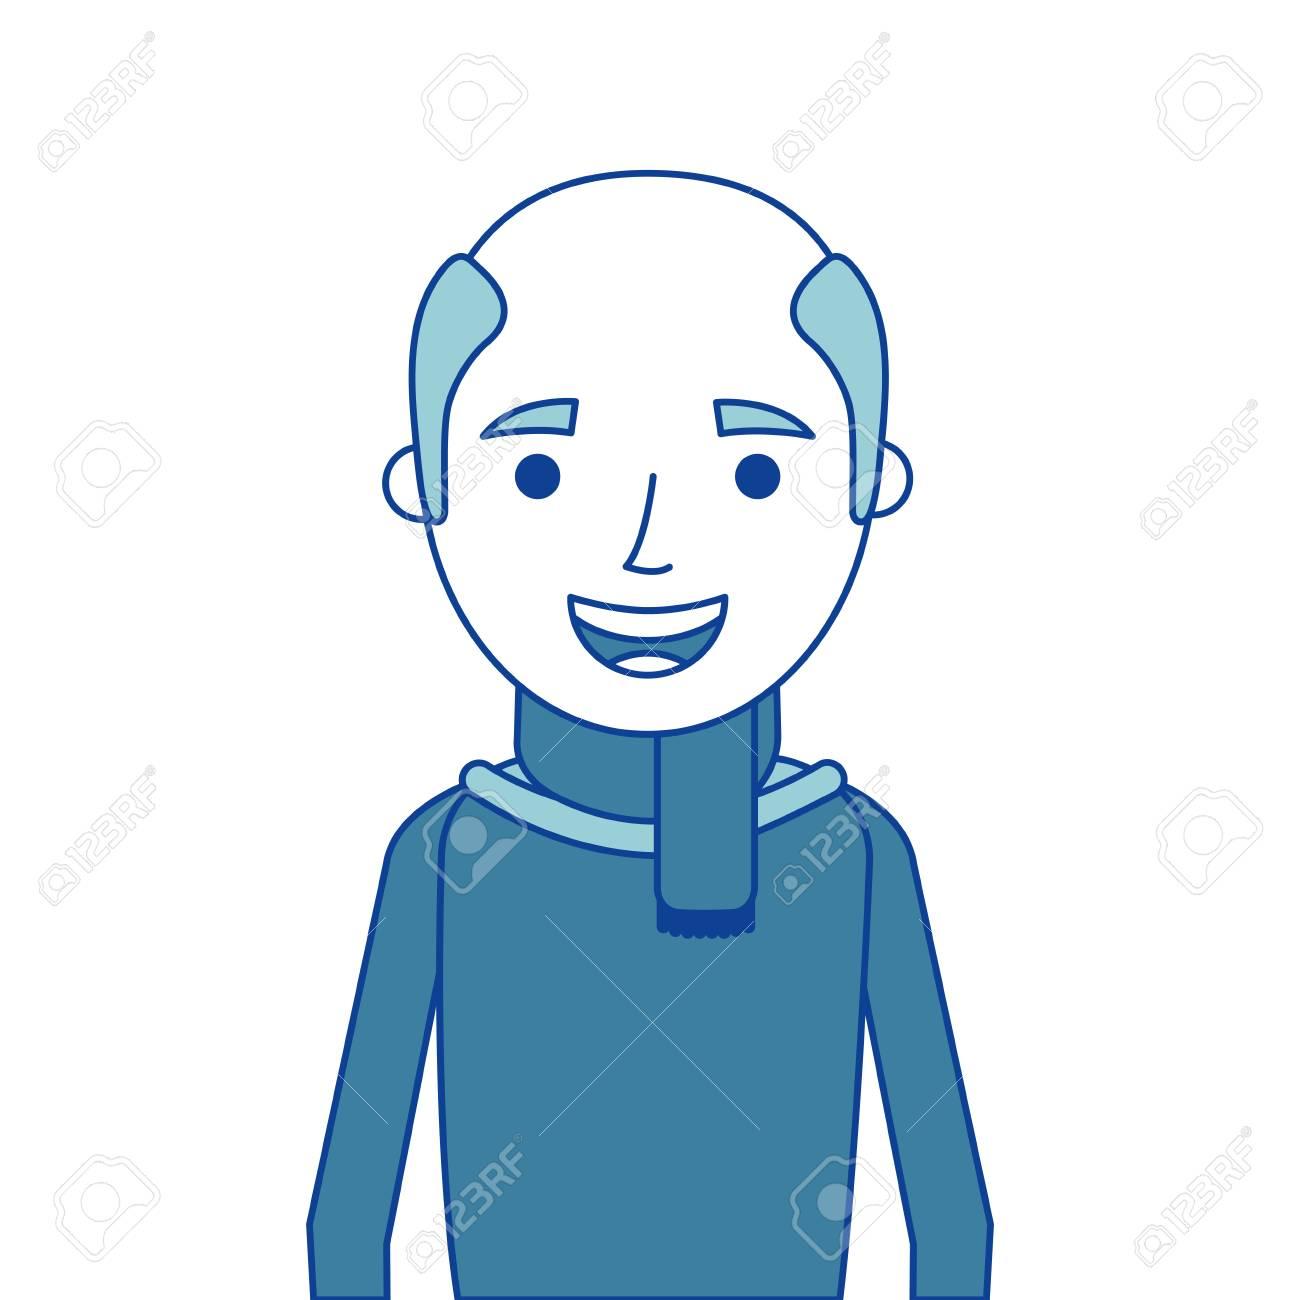 41e91745e old man portrait of a pensioner grandfather character blue vector..